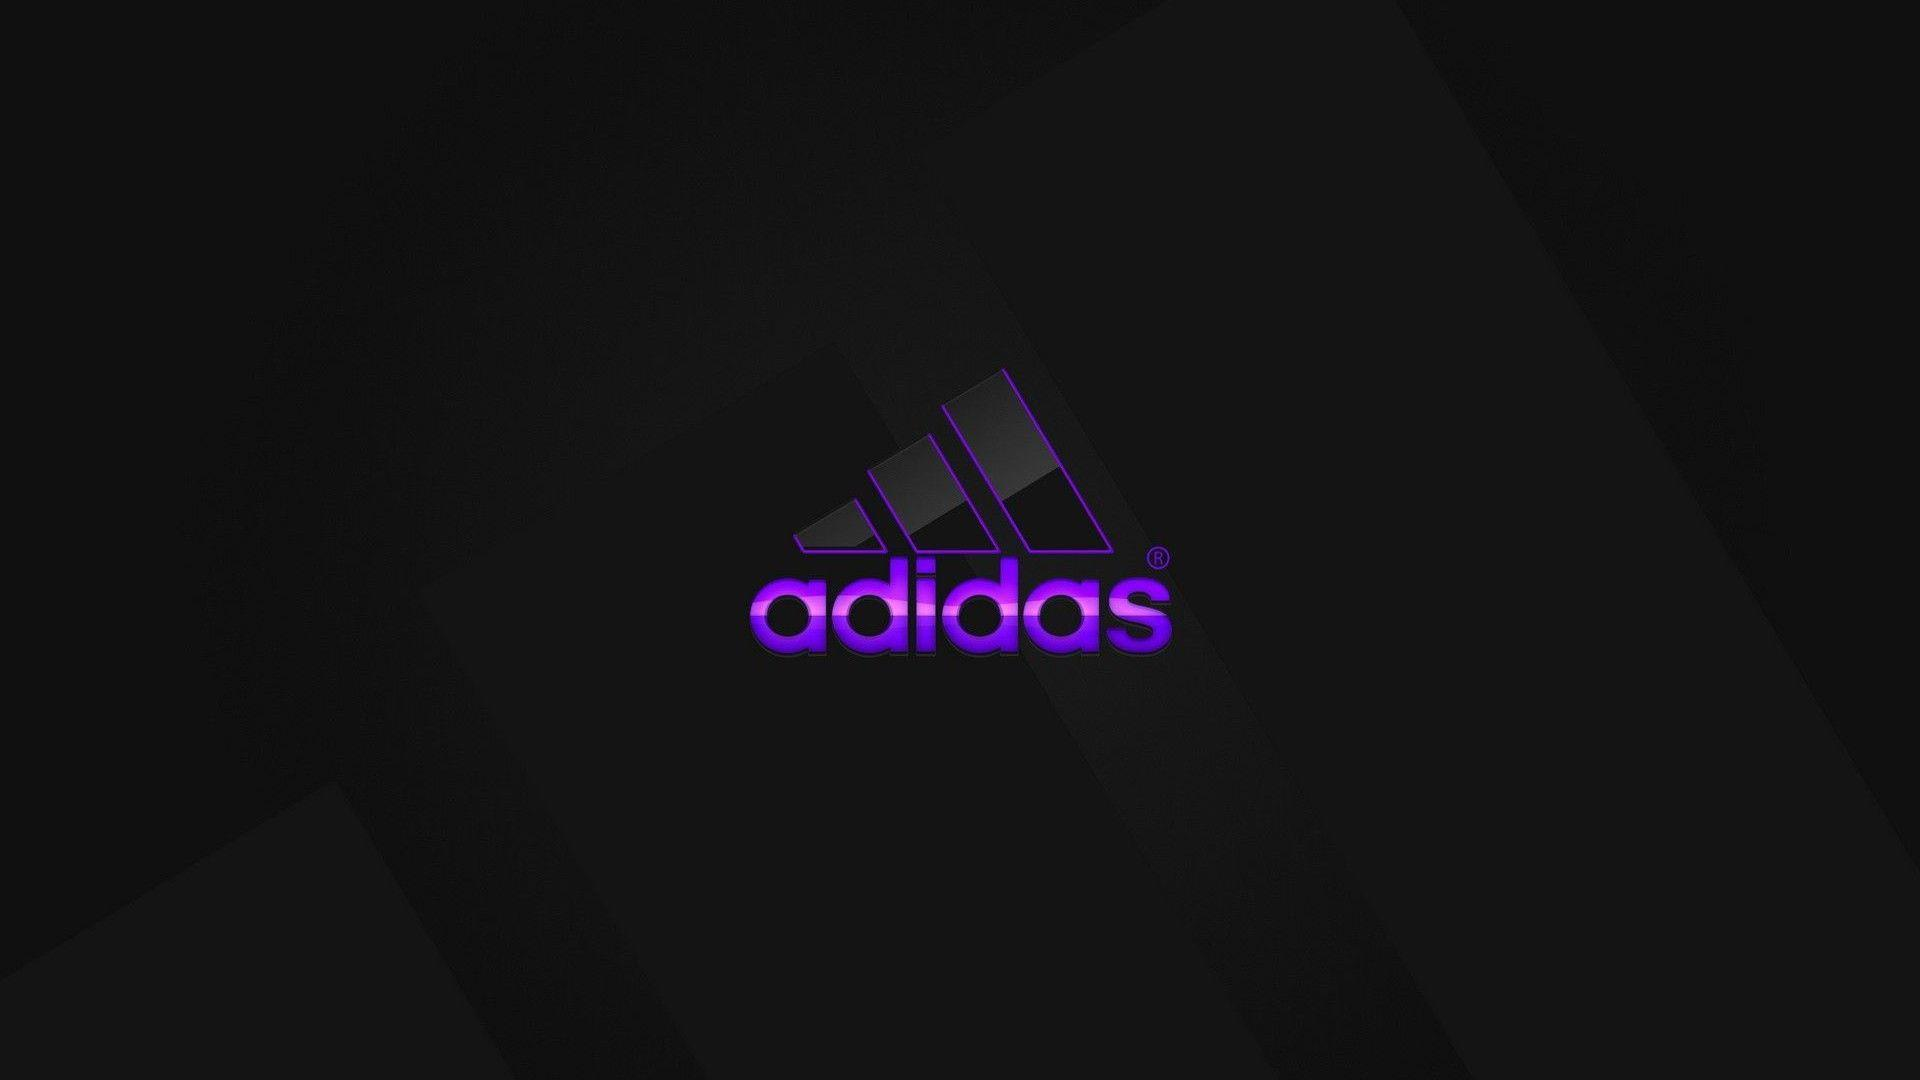 adidas blue logo 1920x1080 - photo #8